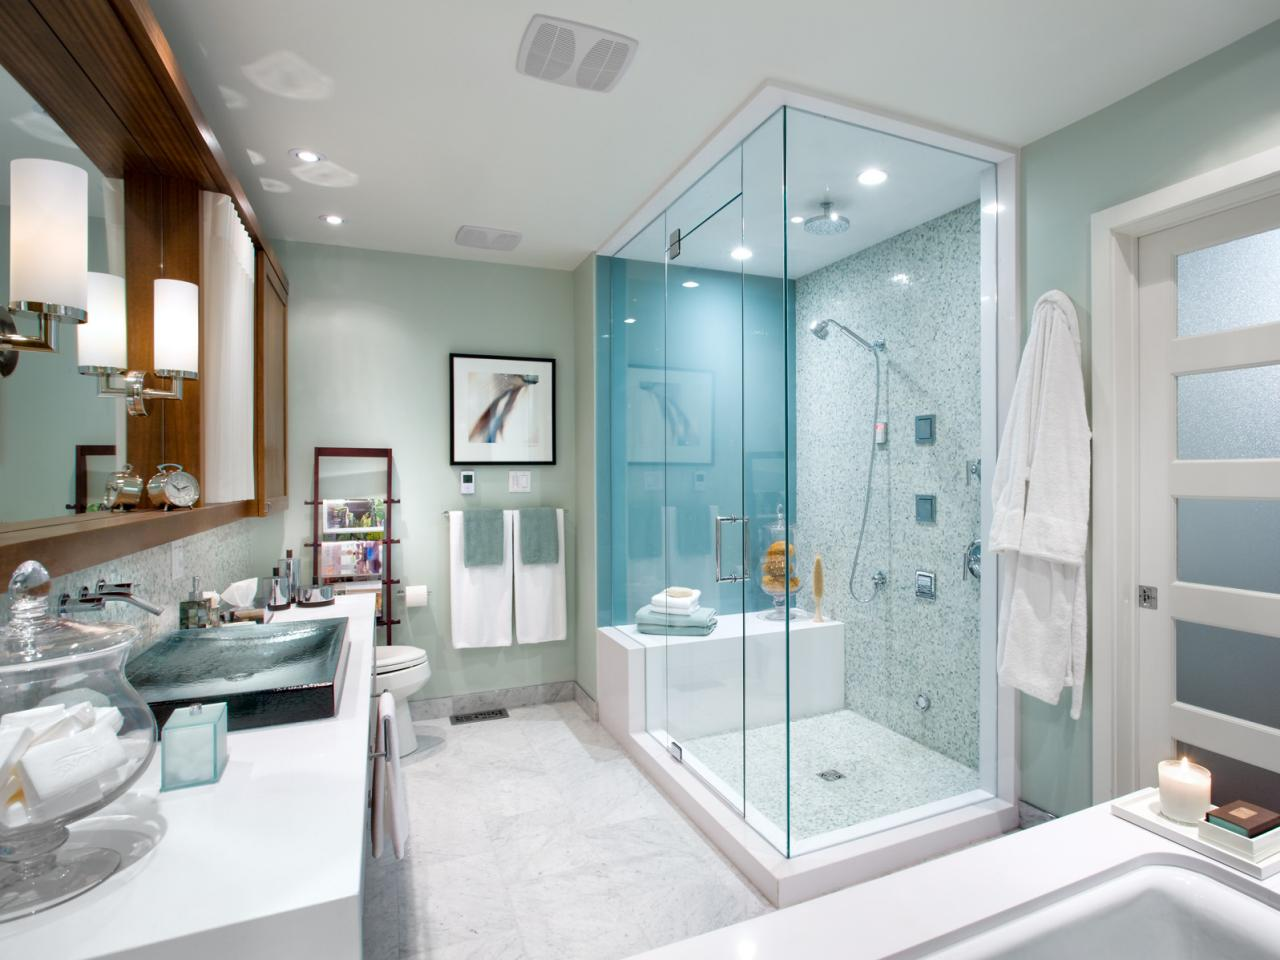 Blue Light Bathroom Remodeling Ideas